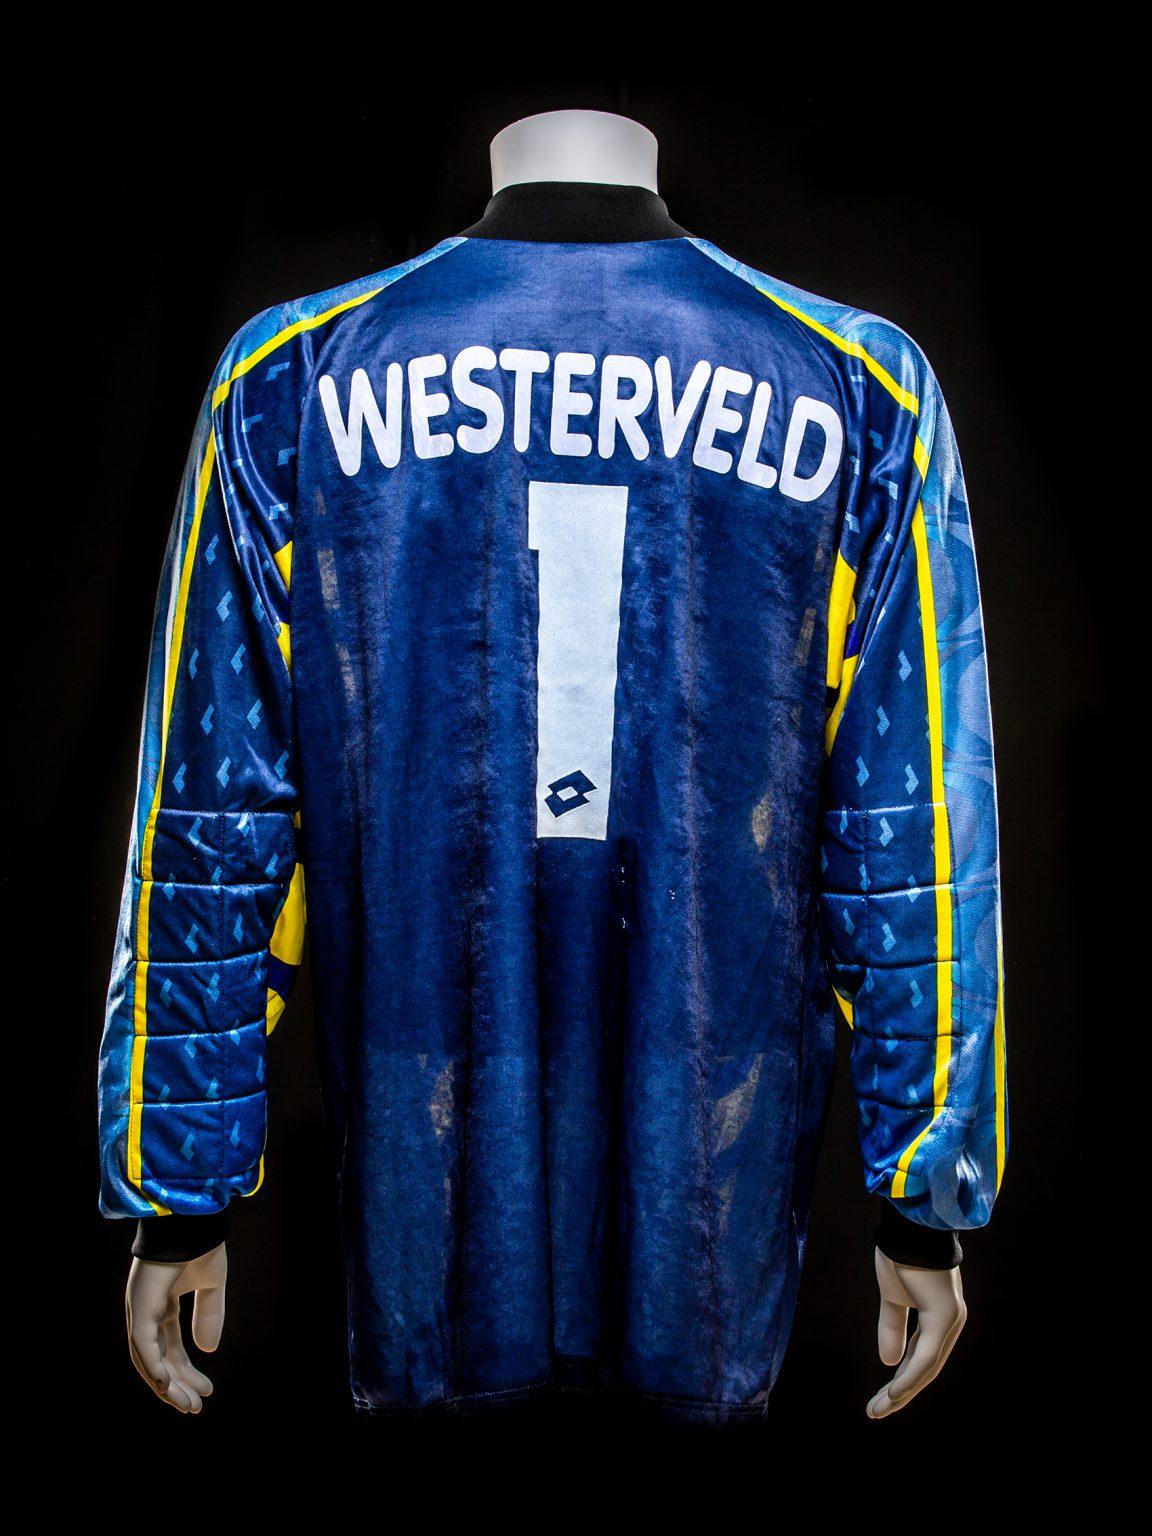 #1 Sander Westerveld